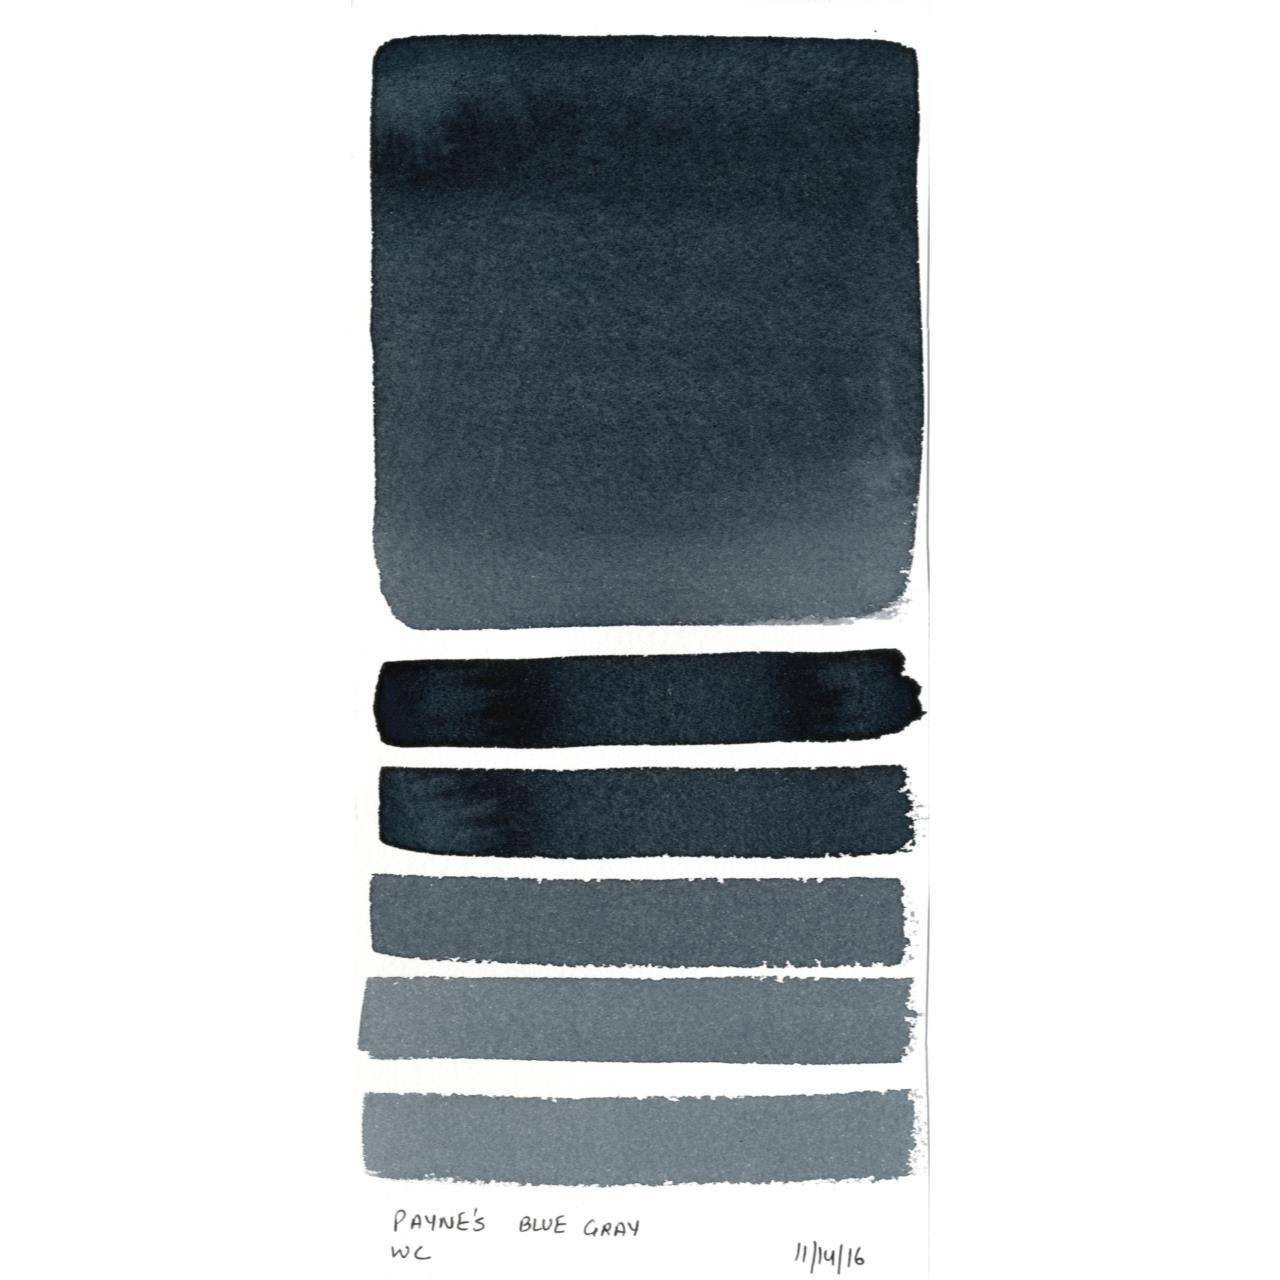 Daniel Smith Paynes Blue Gray